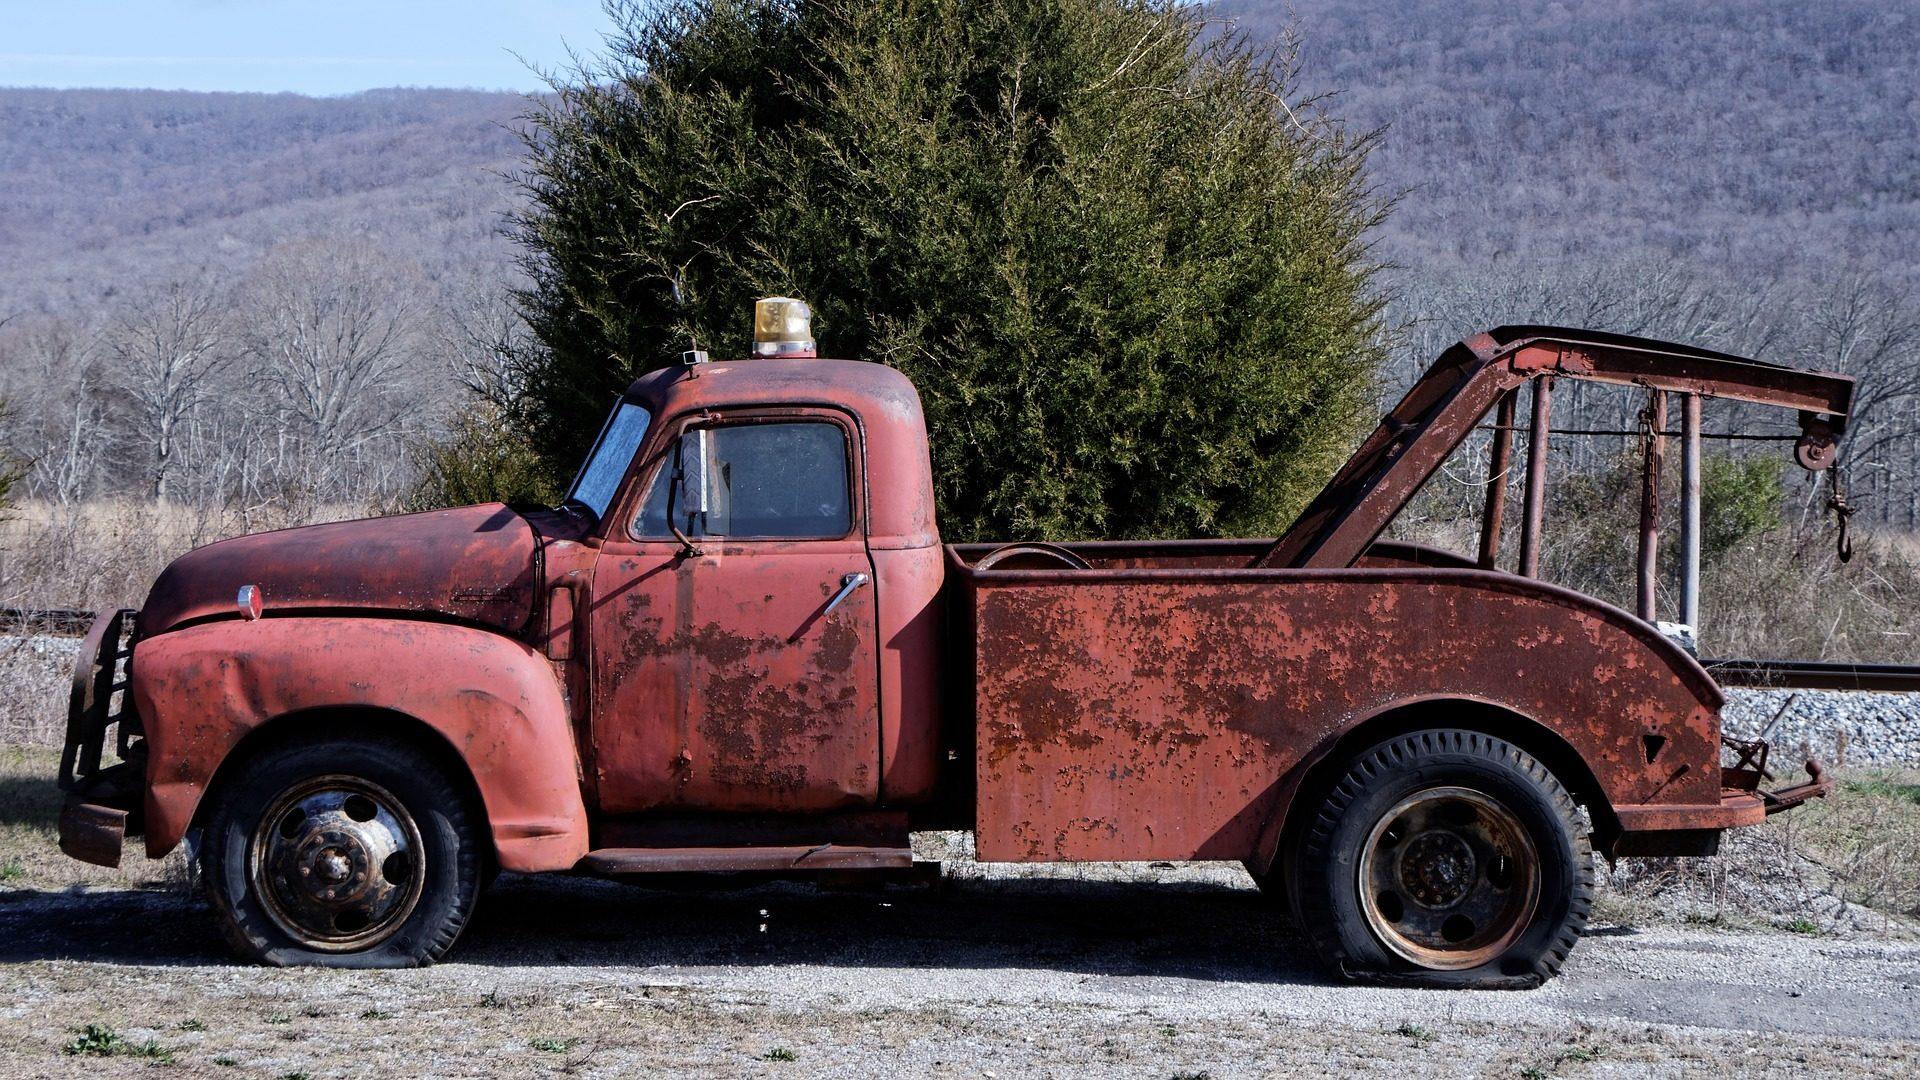 carro, guindaste, Van, velho, vintage, Enferrujada - Papéis de parede HD - Professor-falken.com